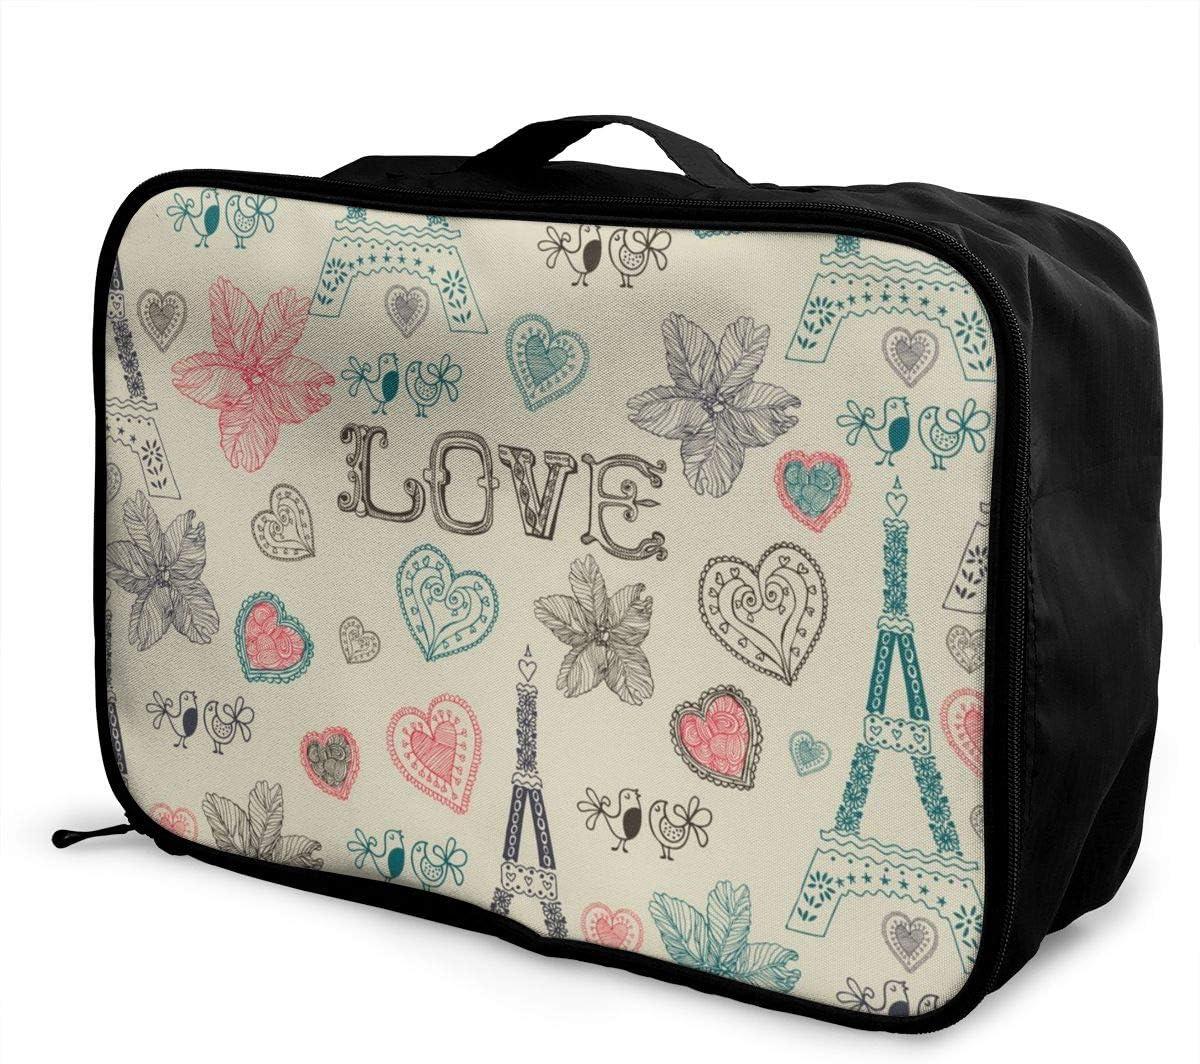 Yunshm Vintage Love Paris Pattern Vector Image Personalized Trolley Handbag Waterproof Unisex Large Capacity For Business Travel Storage